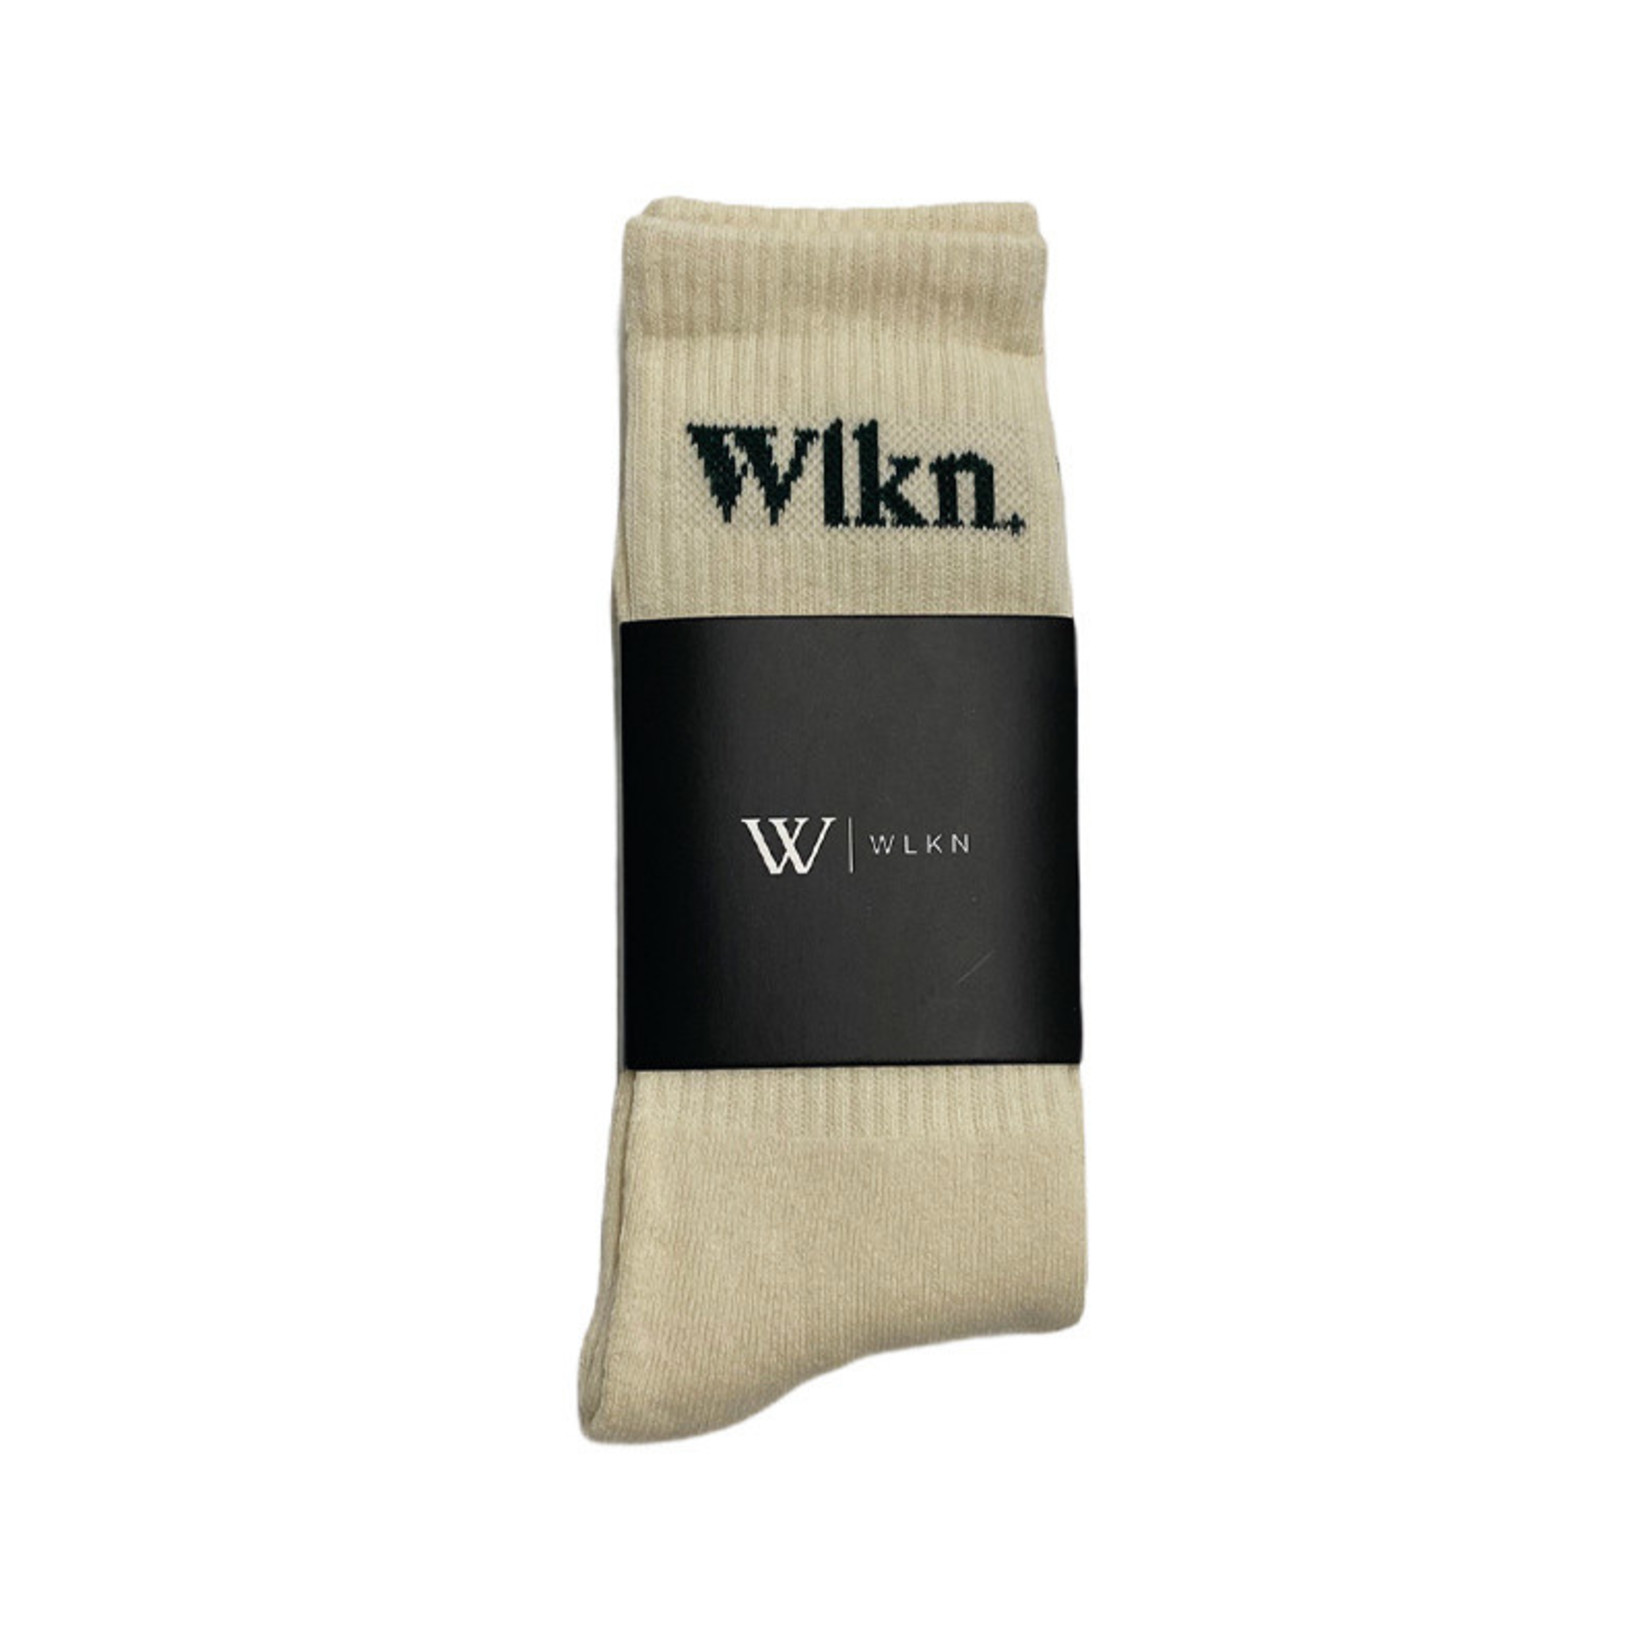 WLKN WLKN : Vintage Socks